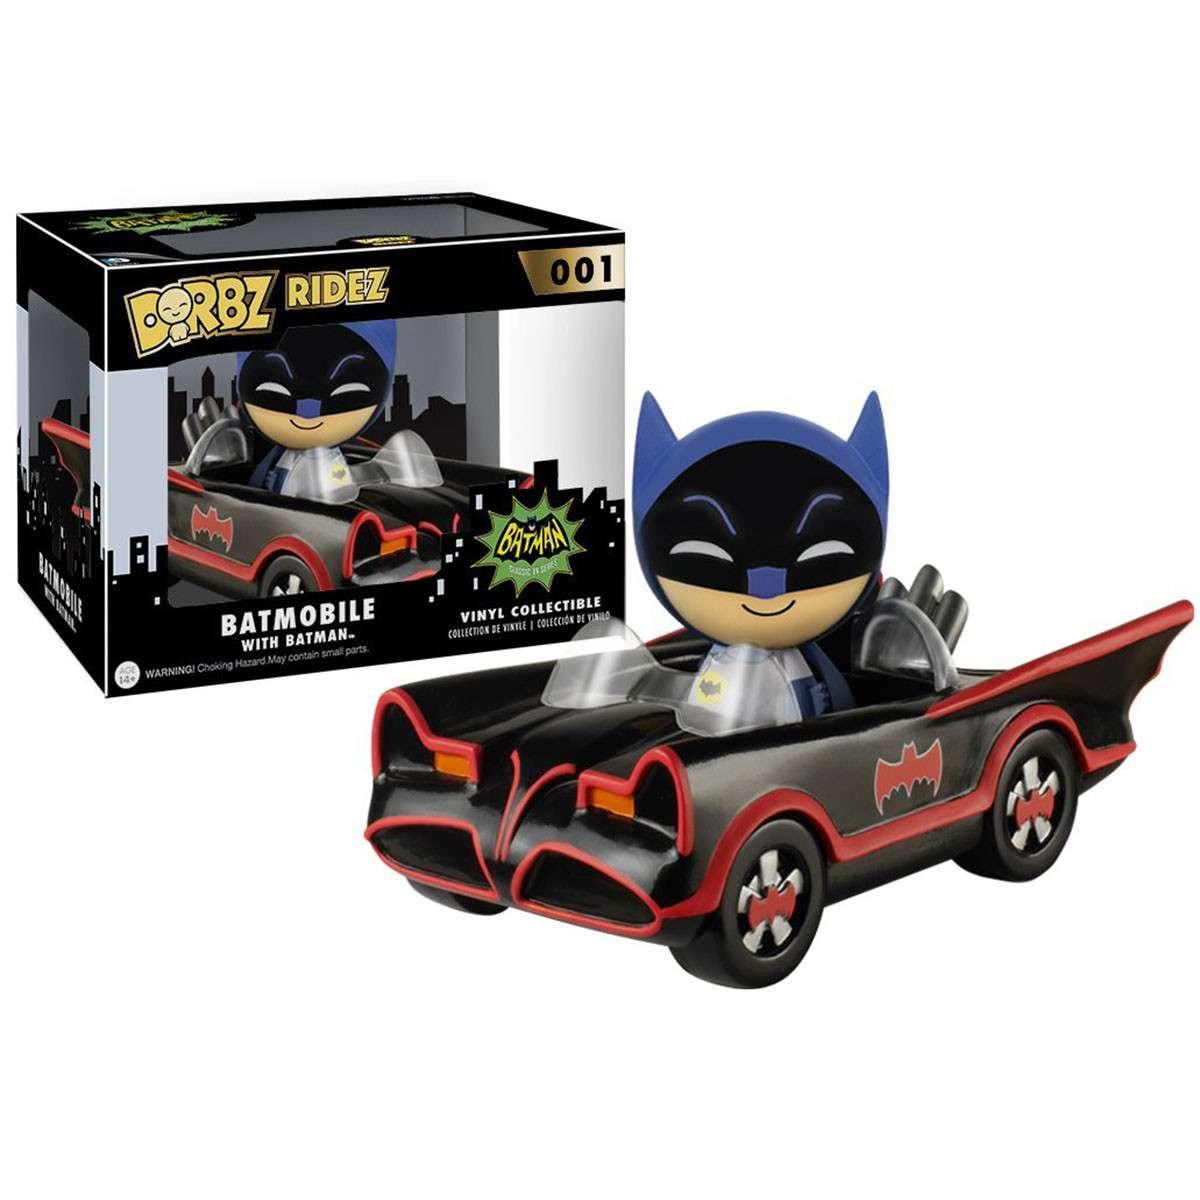 Dorbz Ridez:  1966 Batmobile with Batman Photo